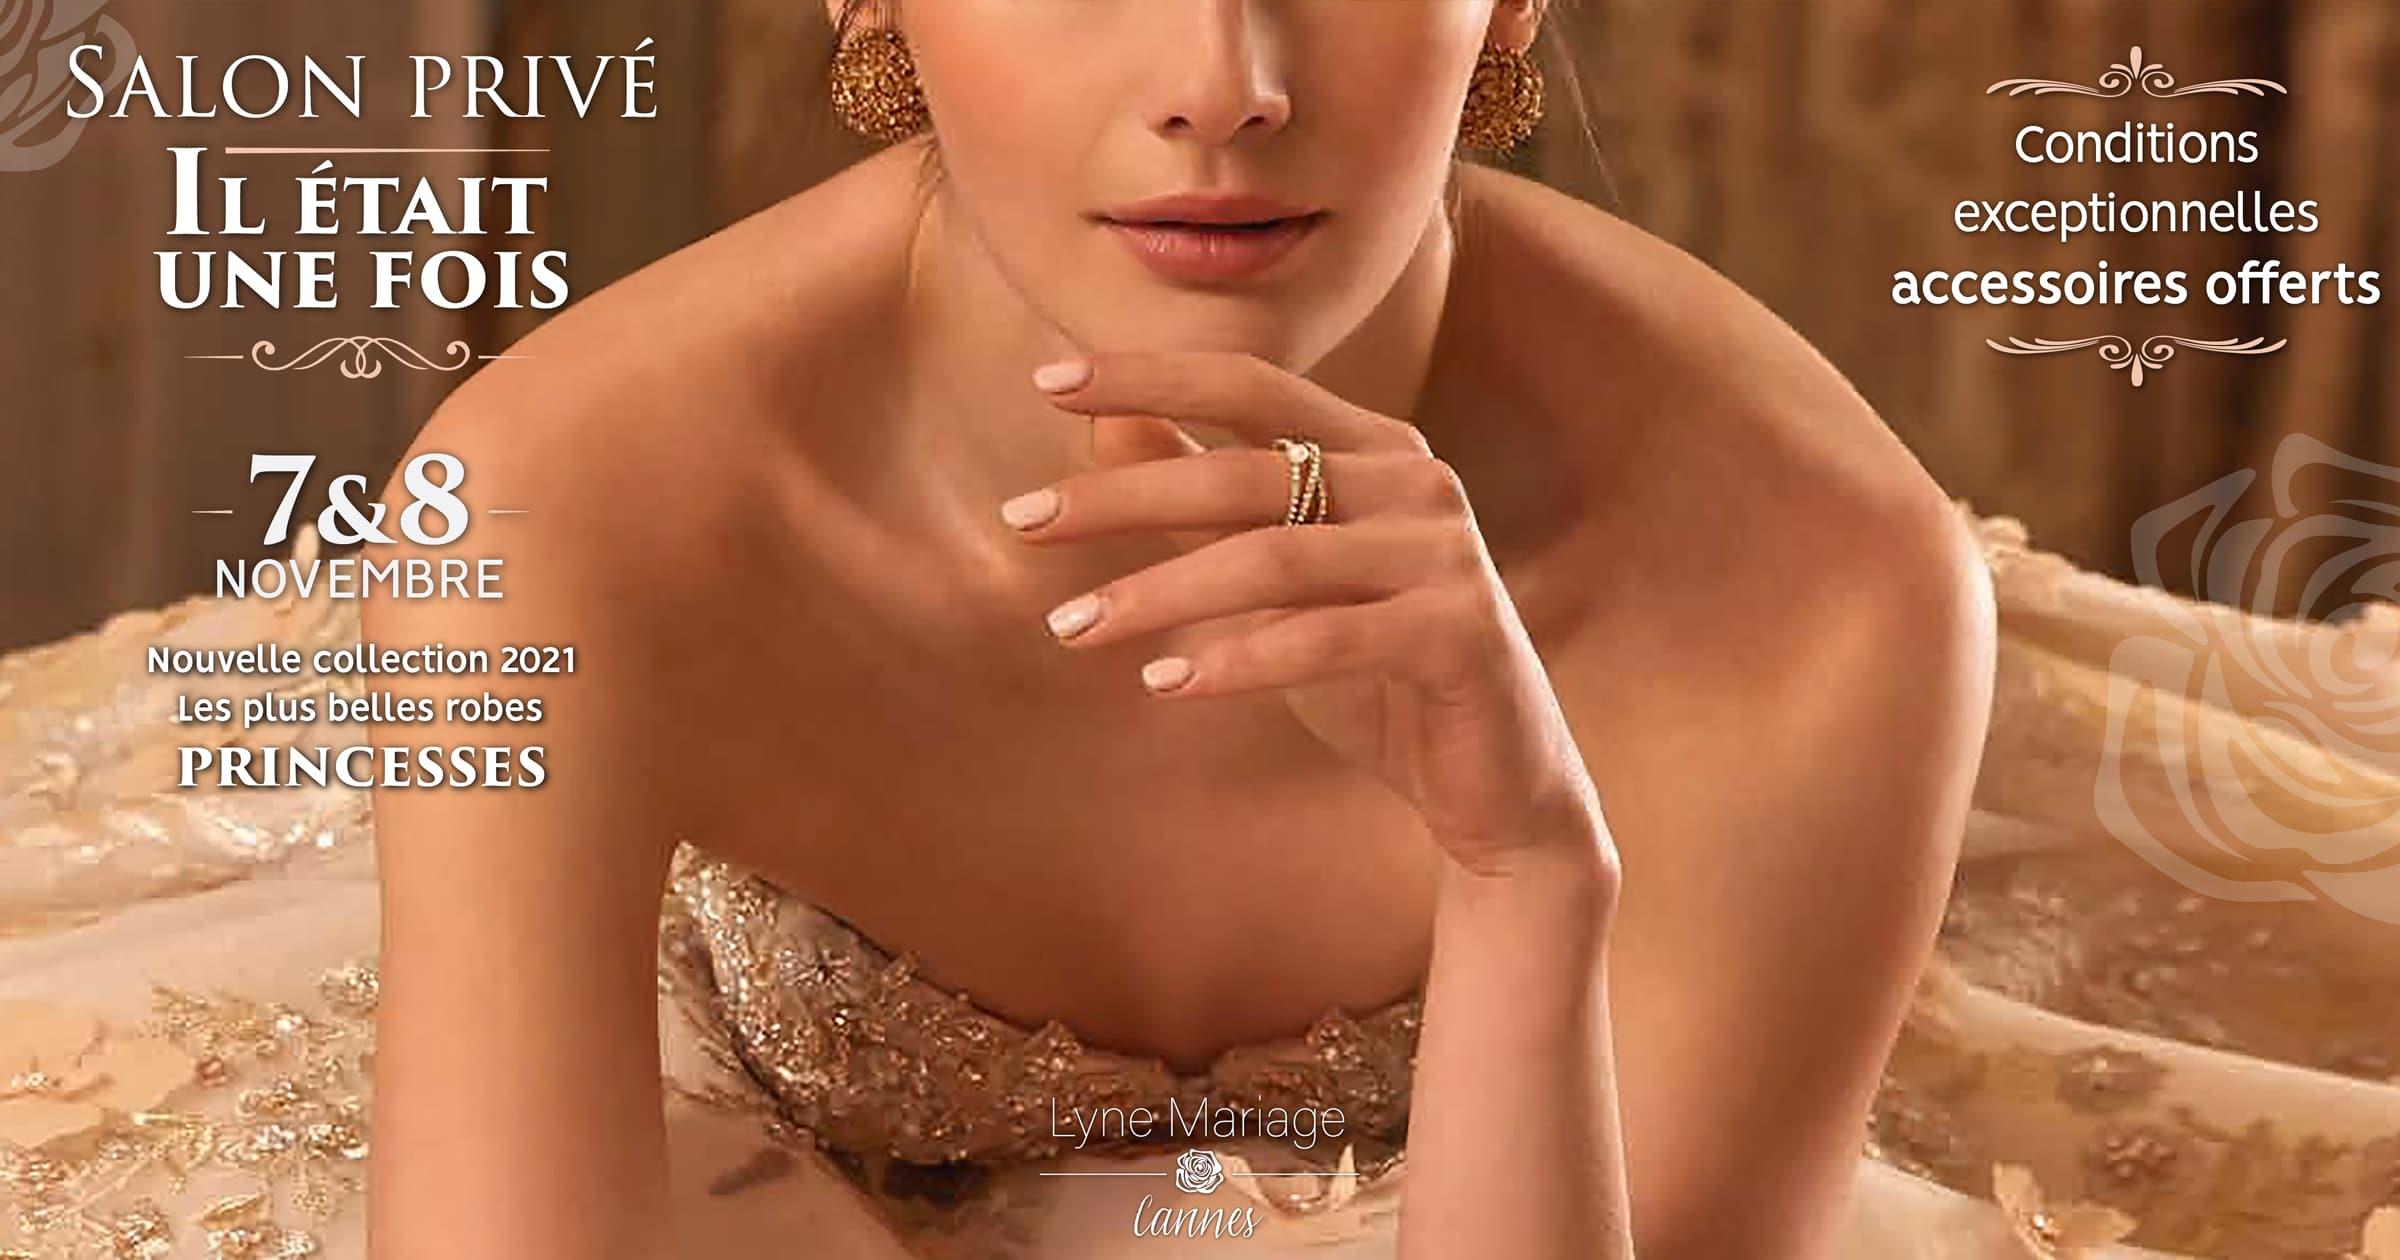 salon-prive-robes-princesses-lyne-mariage-cannes